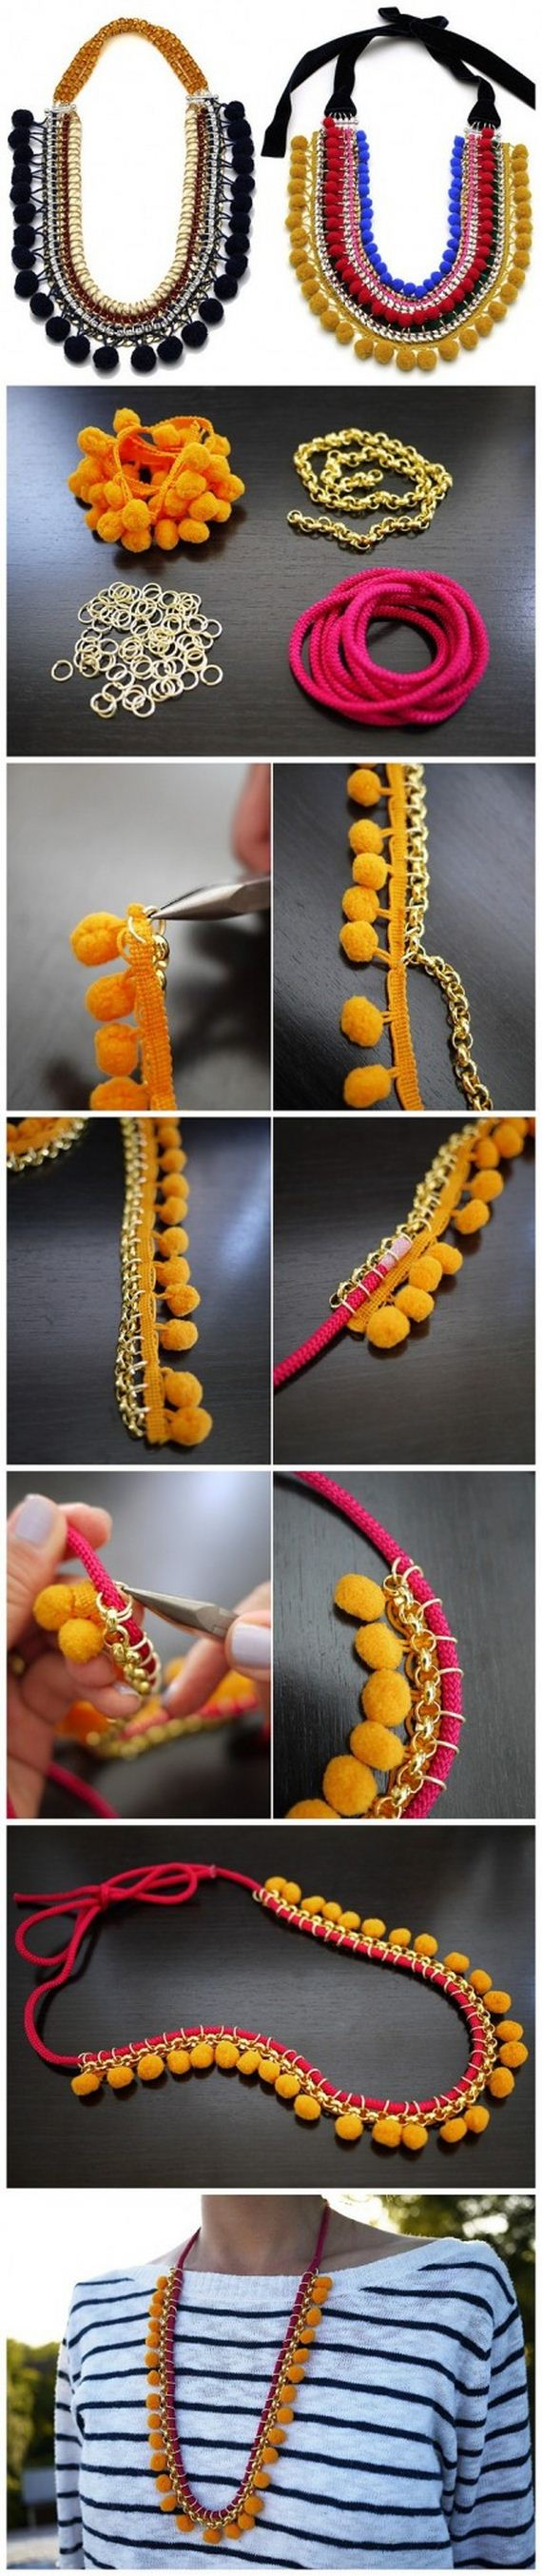 28-diy-statement-necklace-jewelry-tutorial-ideas